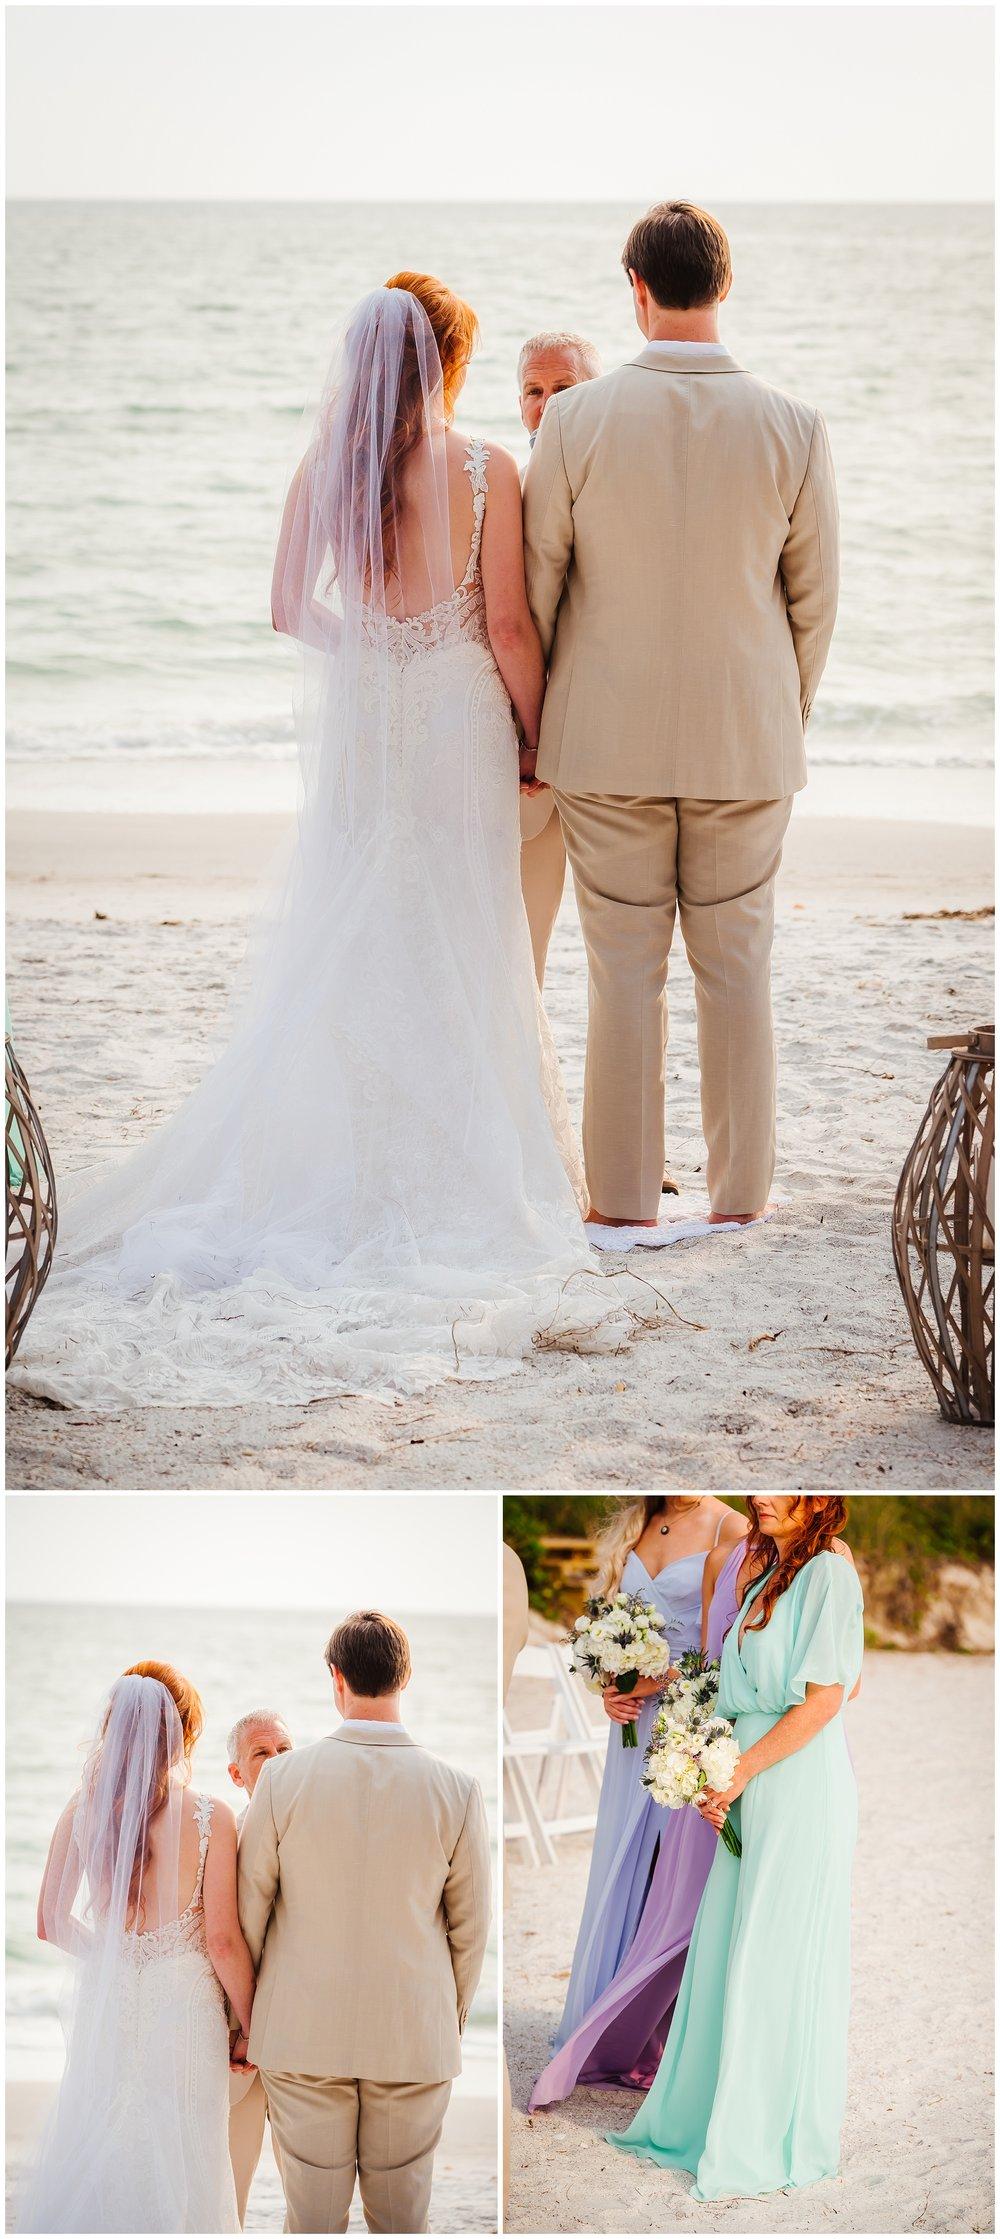 tampa-st-pete-wedding-photographer-indian-rocks-beach-mermaid-train-redhead_0133.jpg